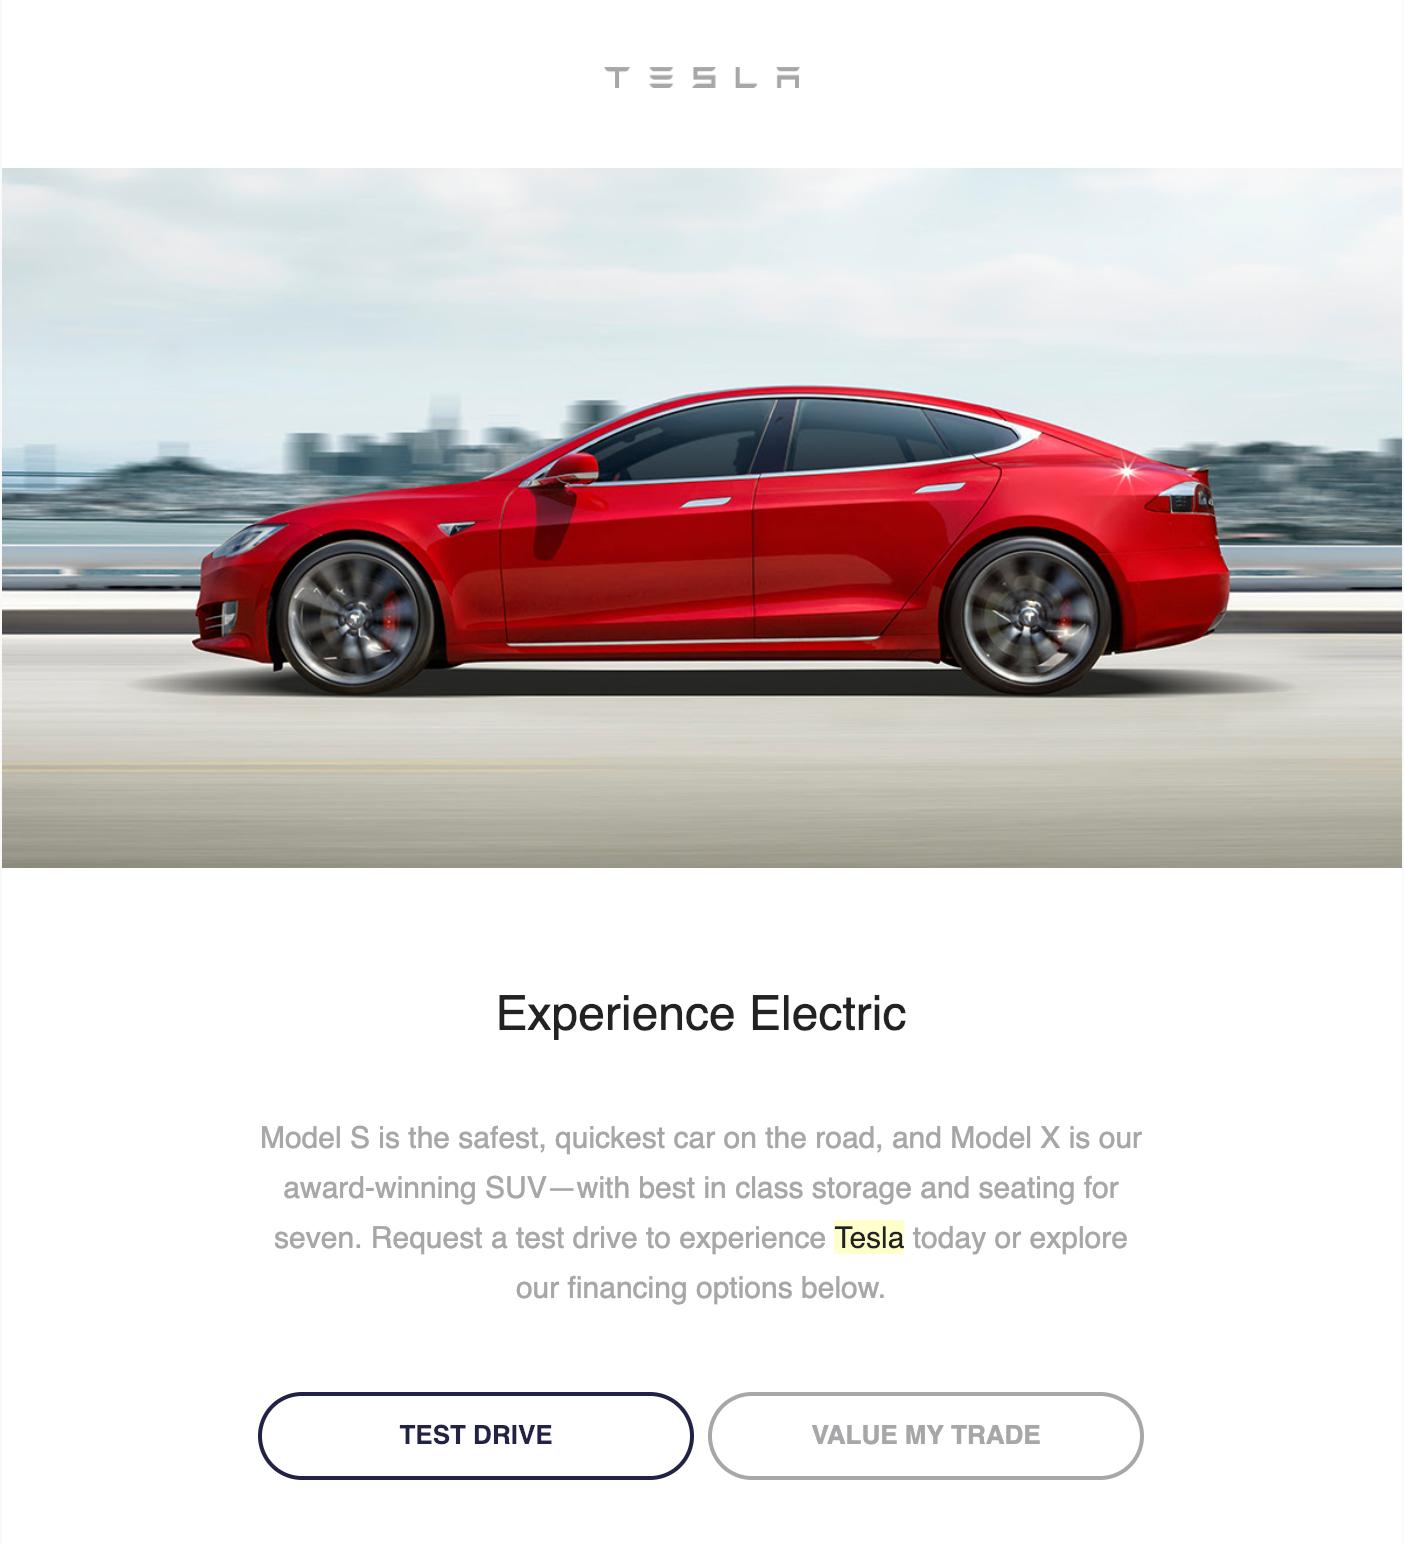 Tesla Updates 1 Billion Miles on Autopilot ian jacob searchandbefound com au Search amp Be Found Mail